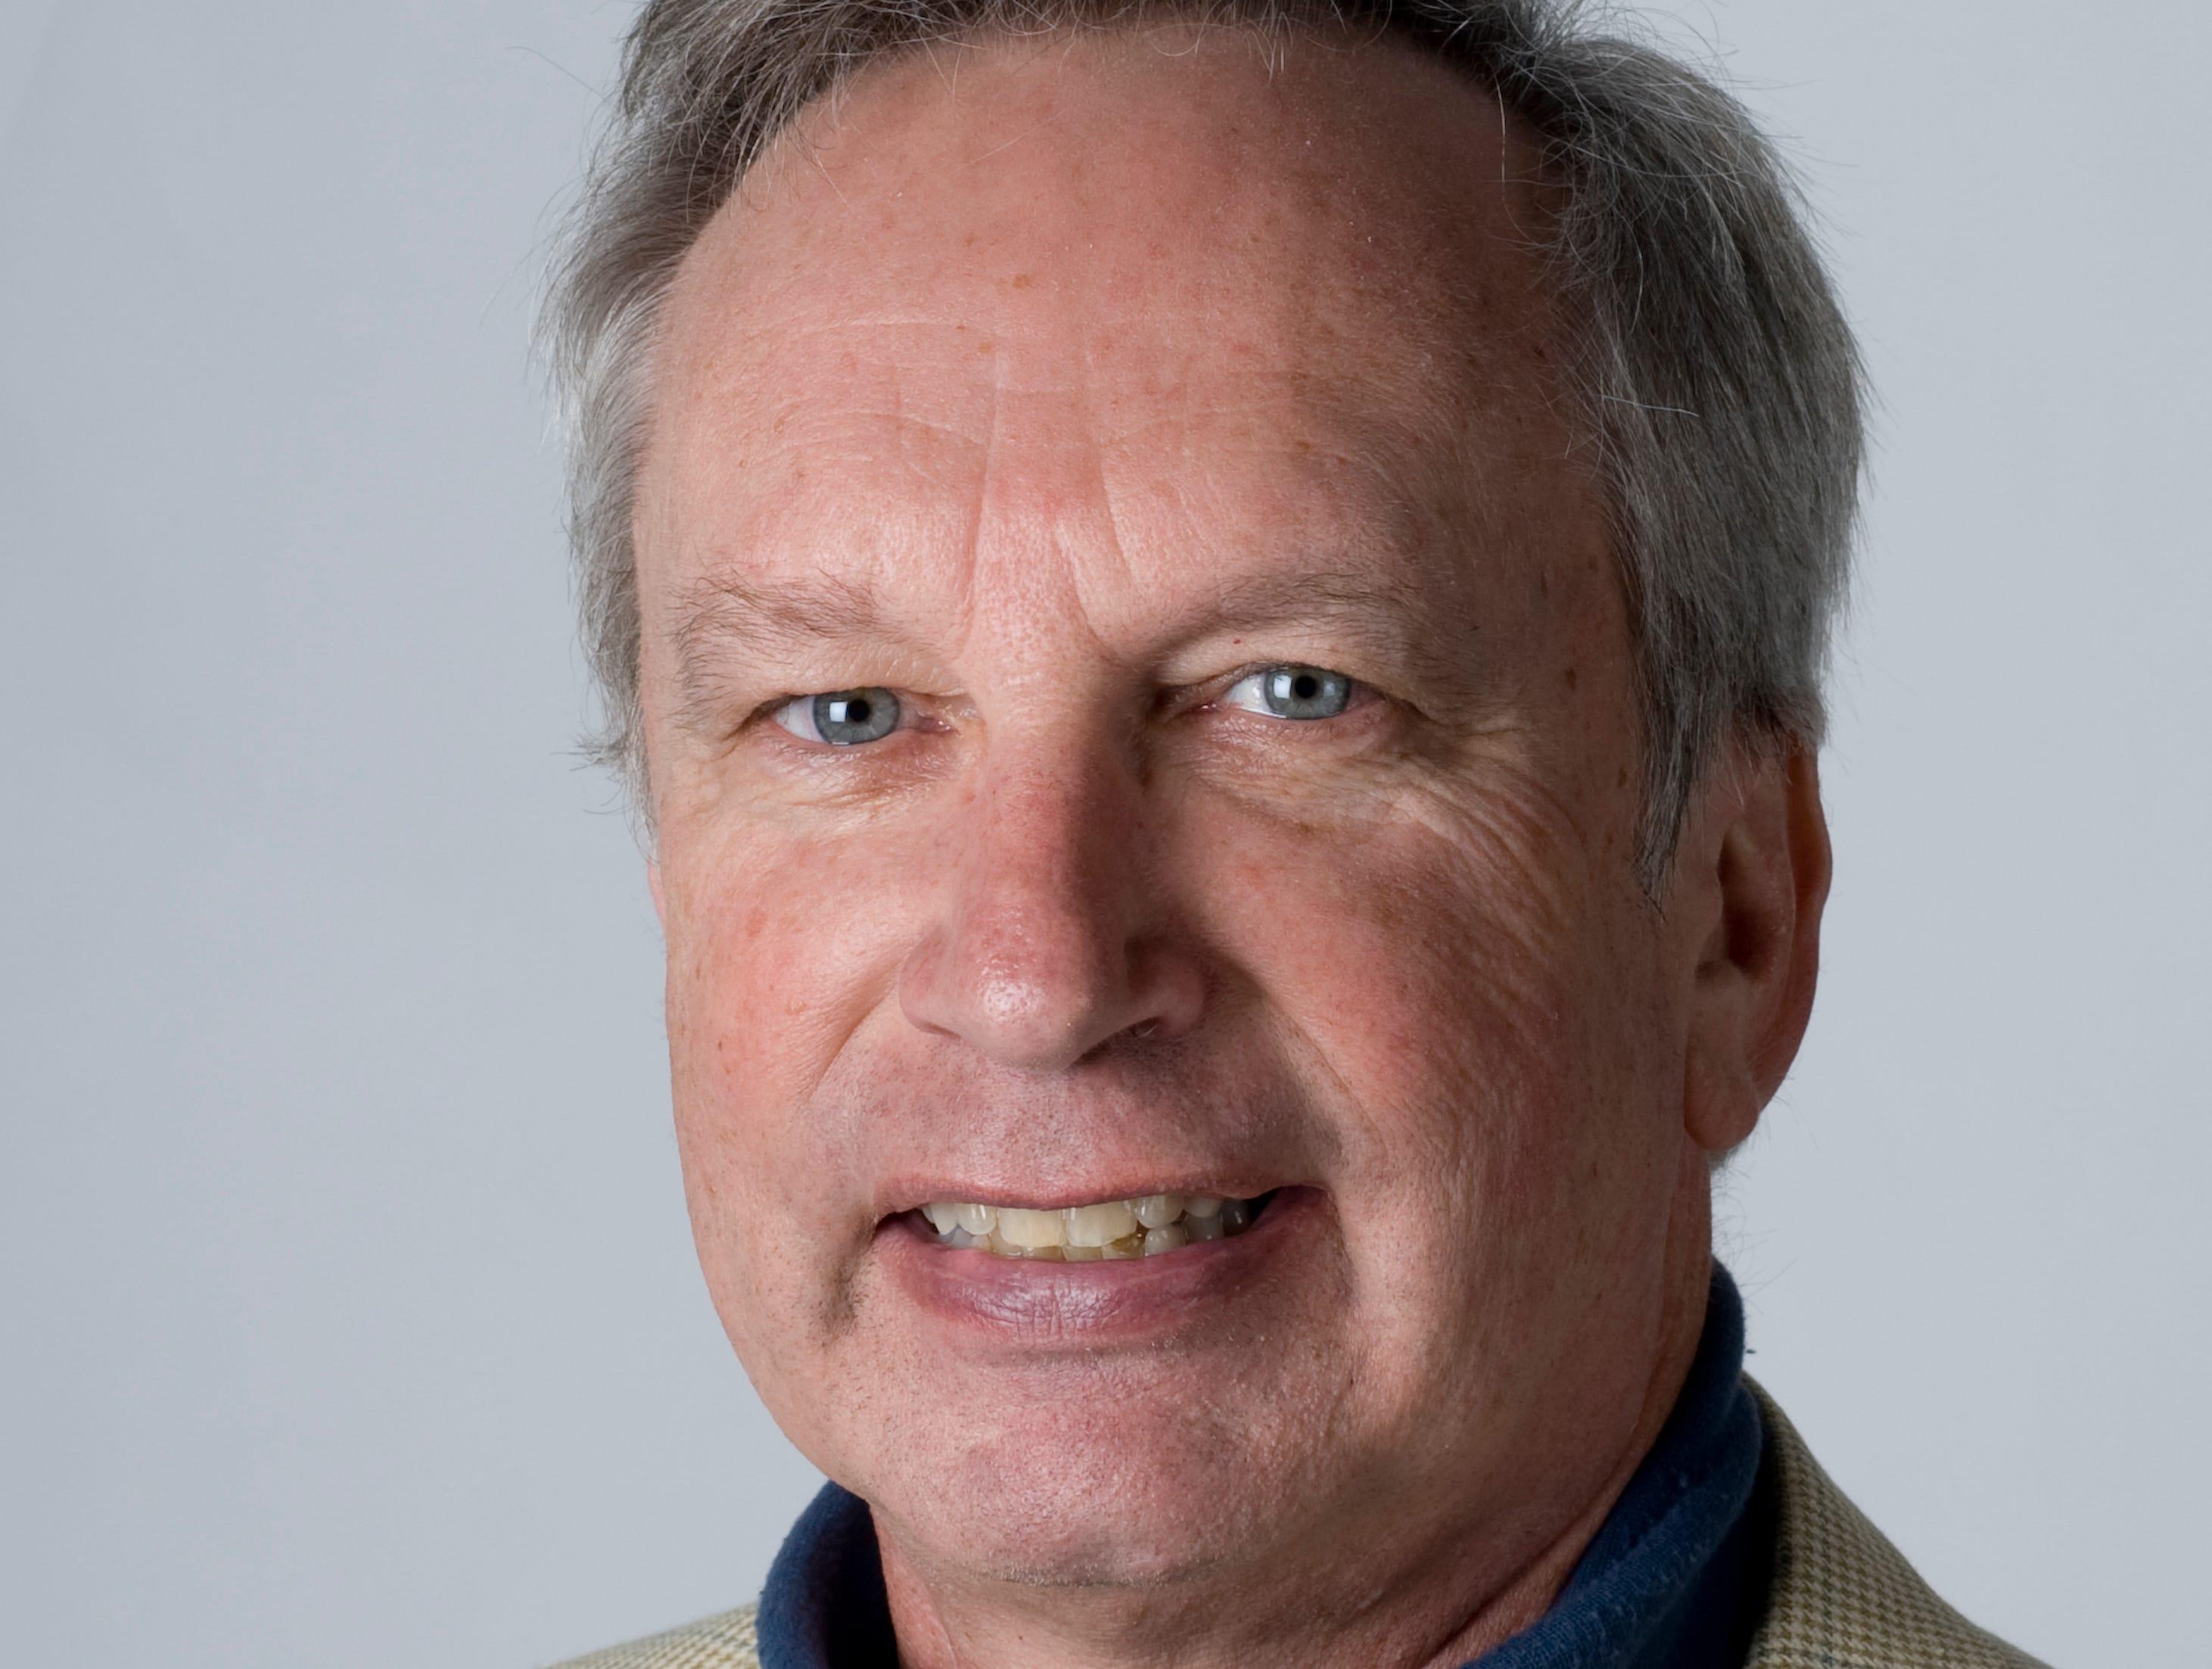 John Adams, KNS sportswriter, 2009.